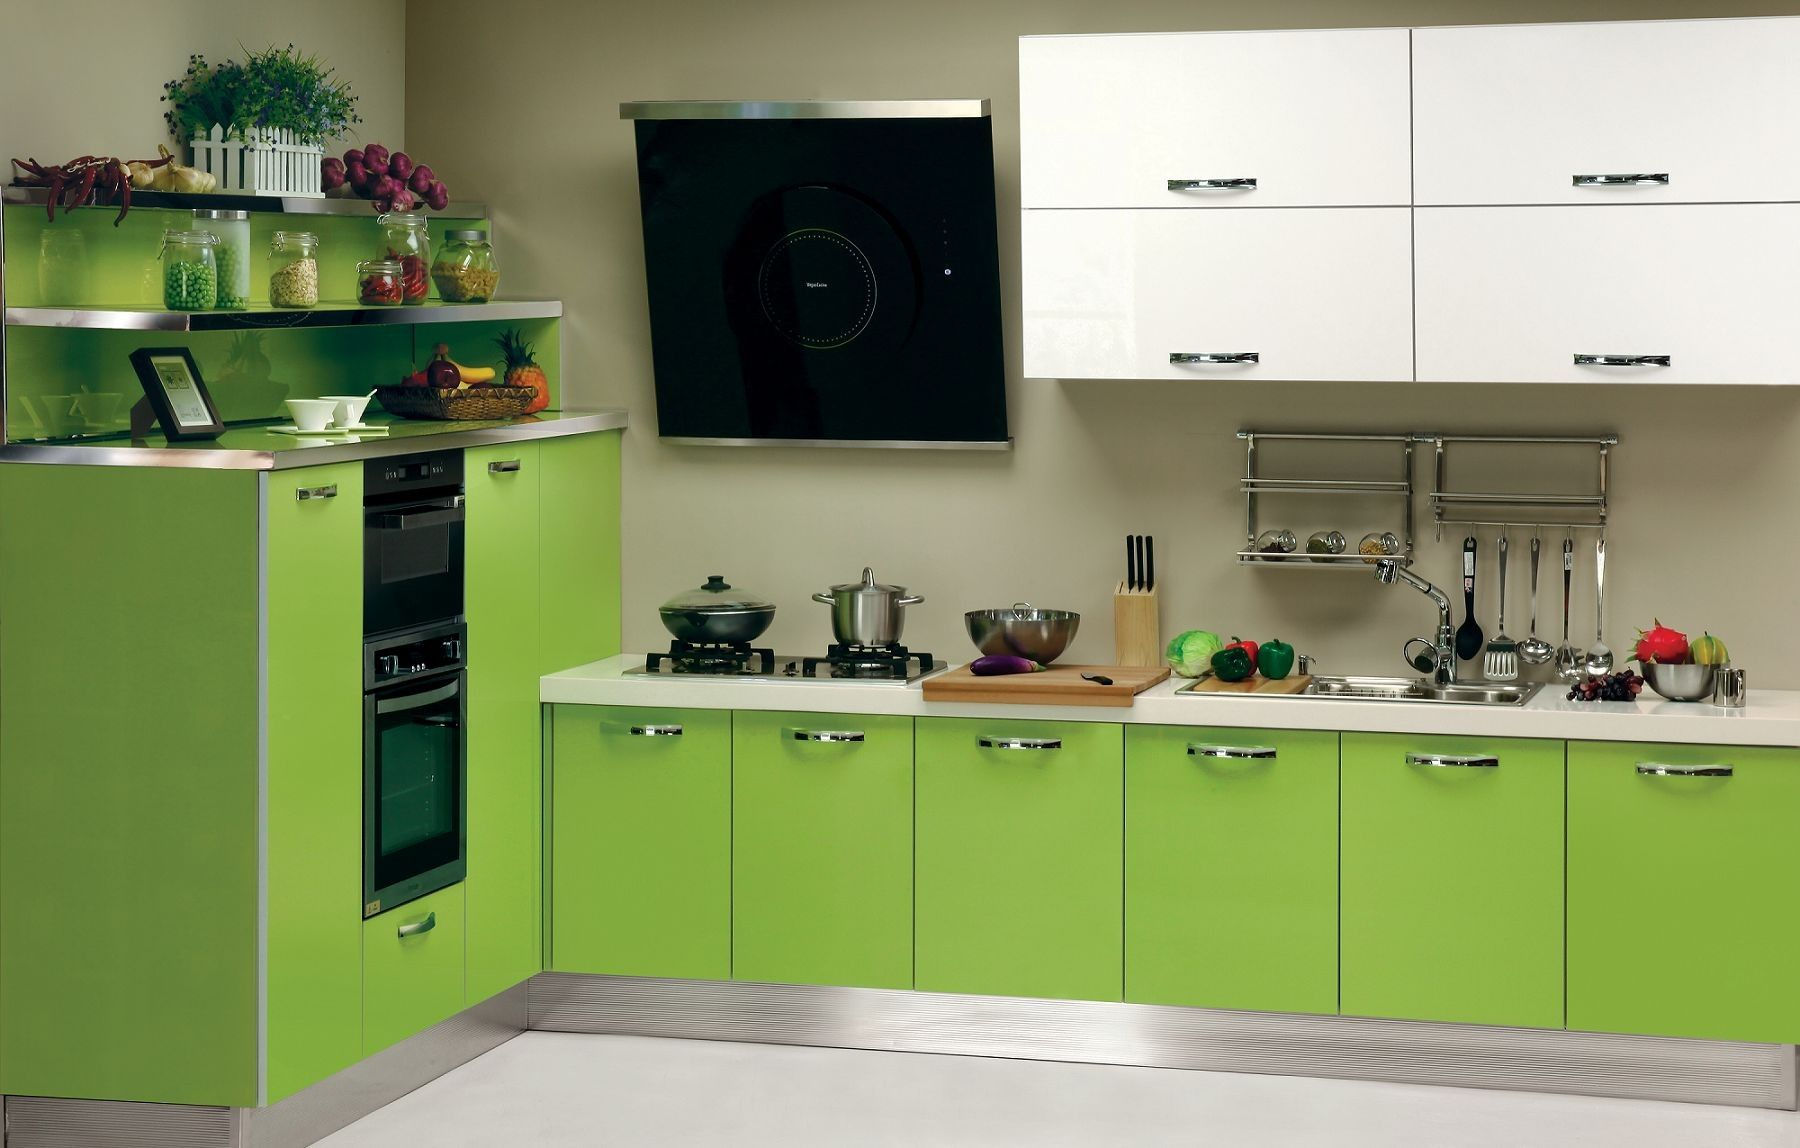 Muebles de cocina, muebles de cocina chile, muebles de ...